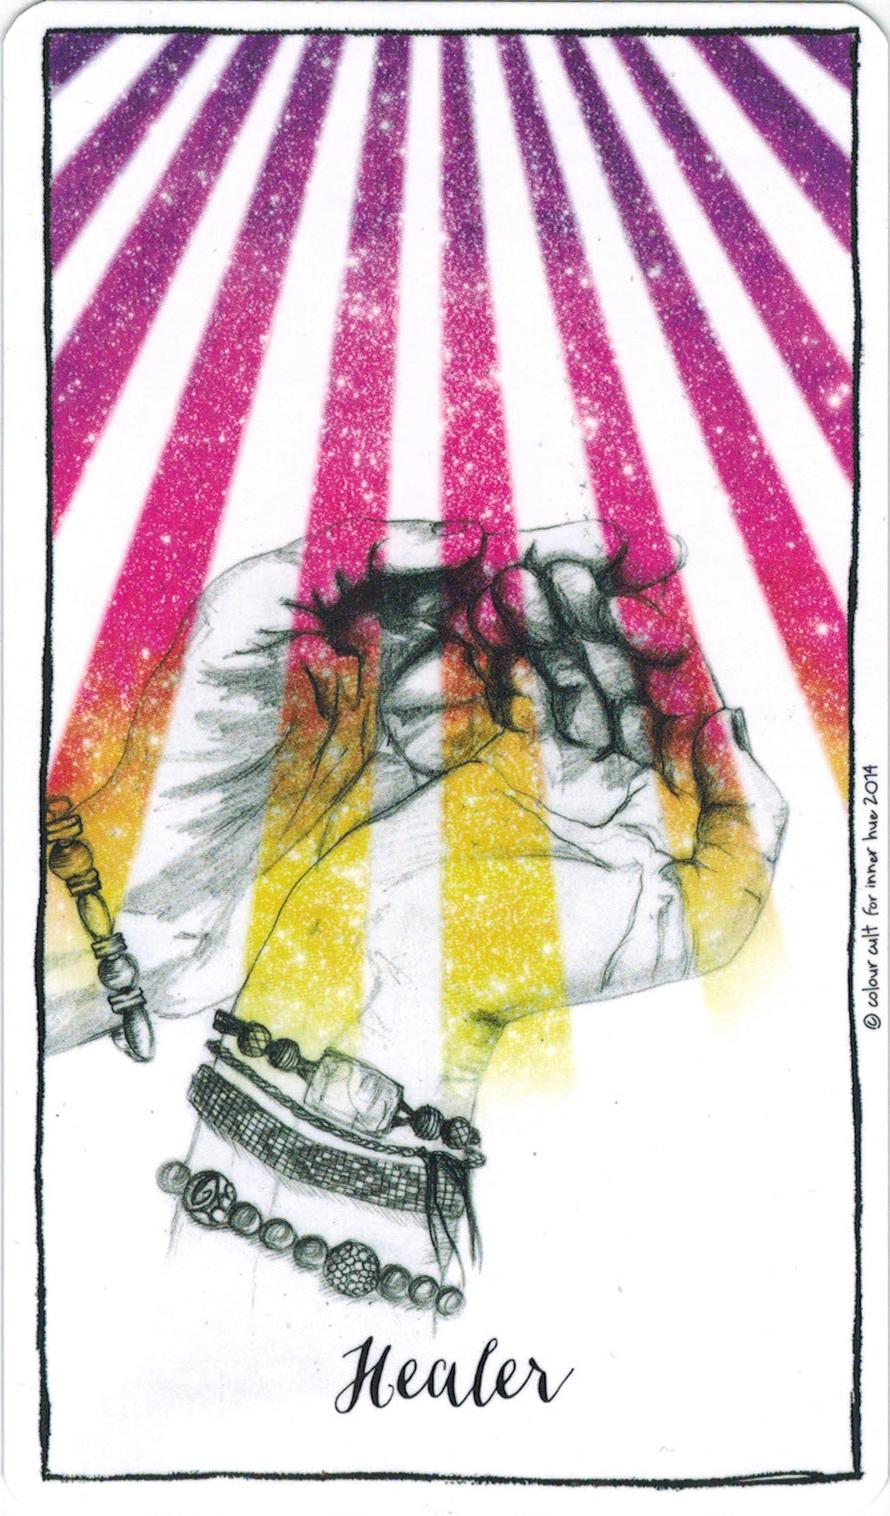 Ý nghĩa lá Healer trong bộ bài Connected & Free - The Alchemist's Oracle